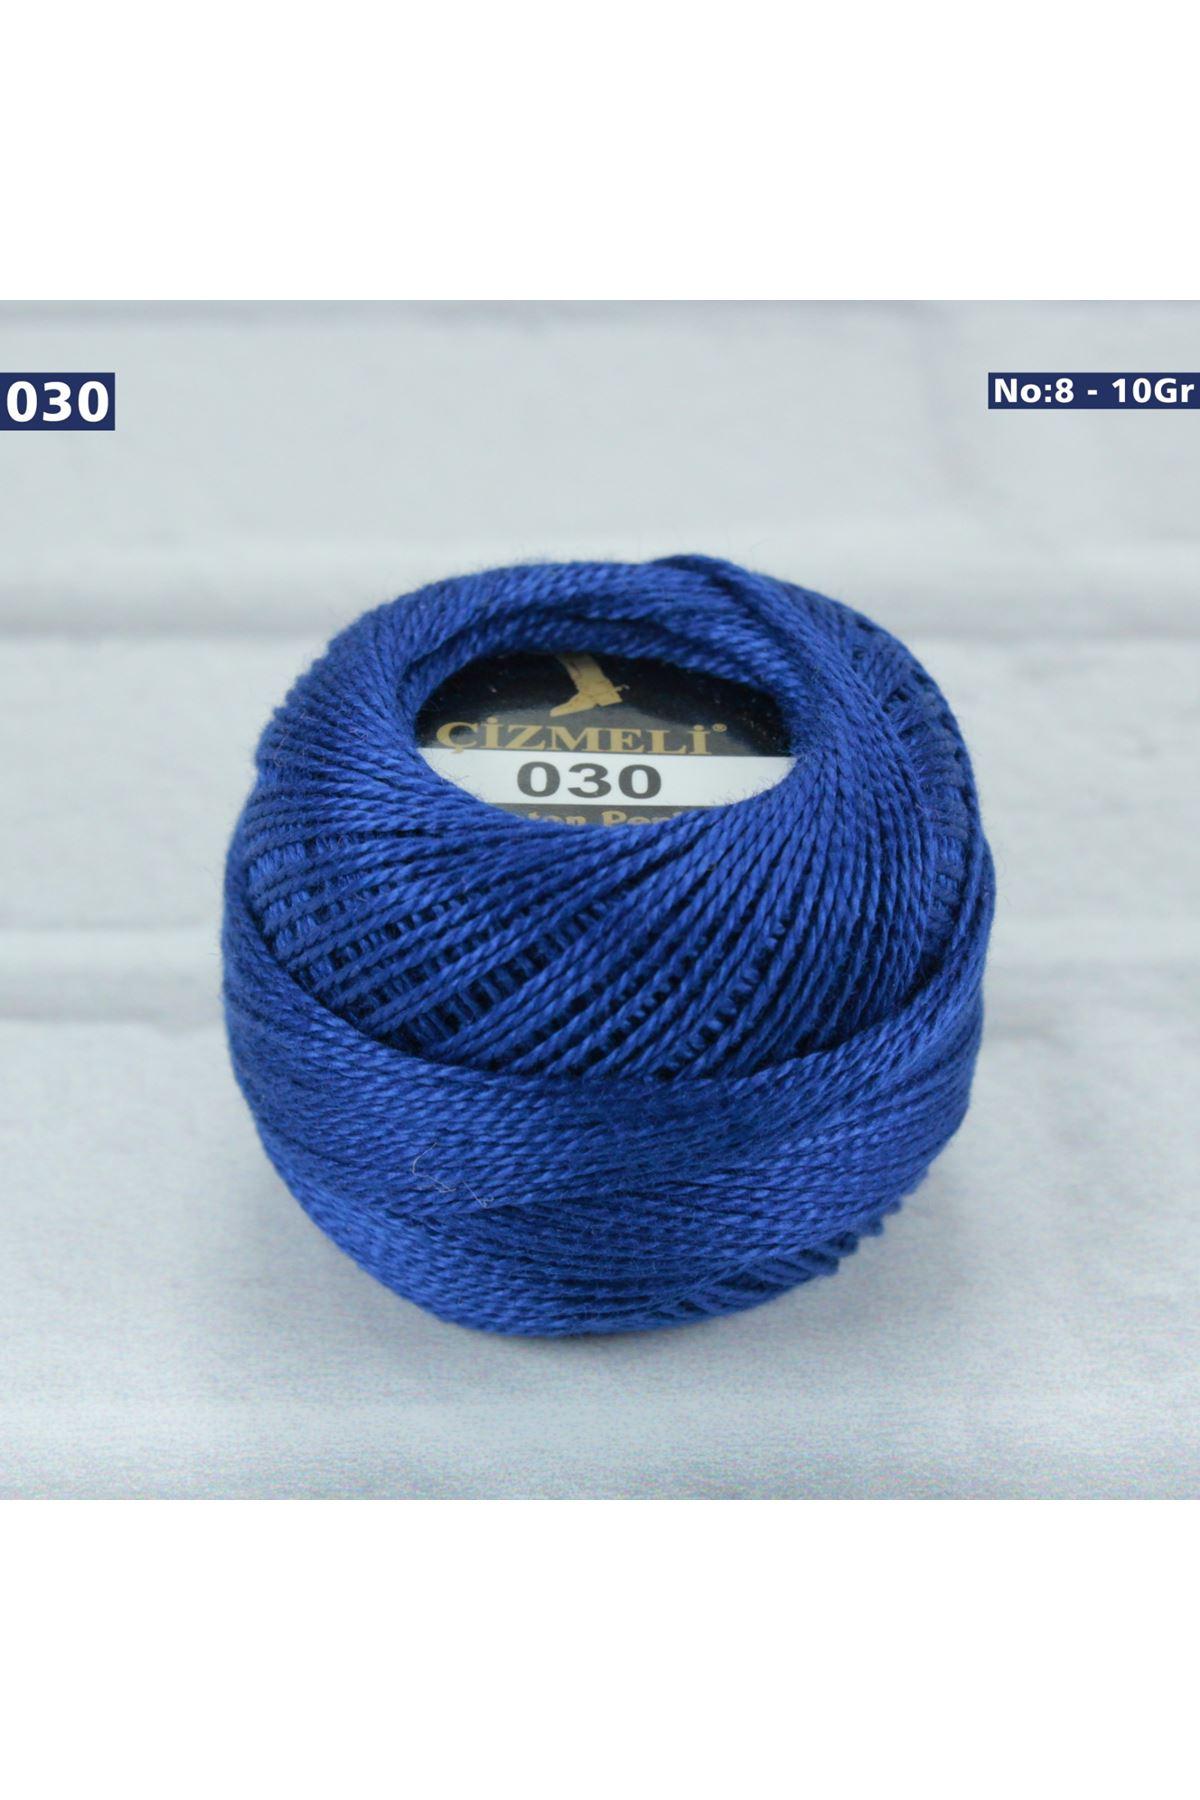 Çizmeli Cotton Perle Nakış İpliği No: 030